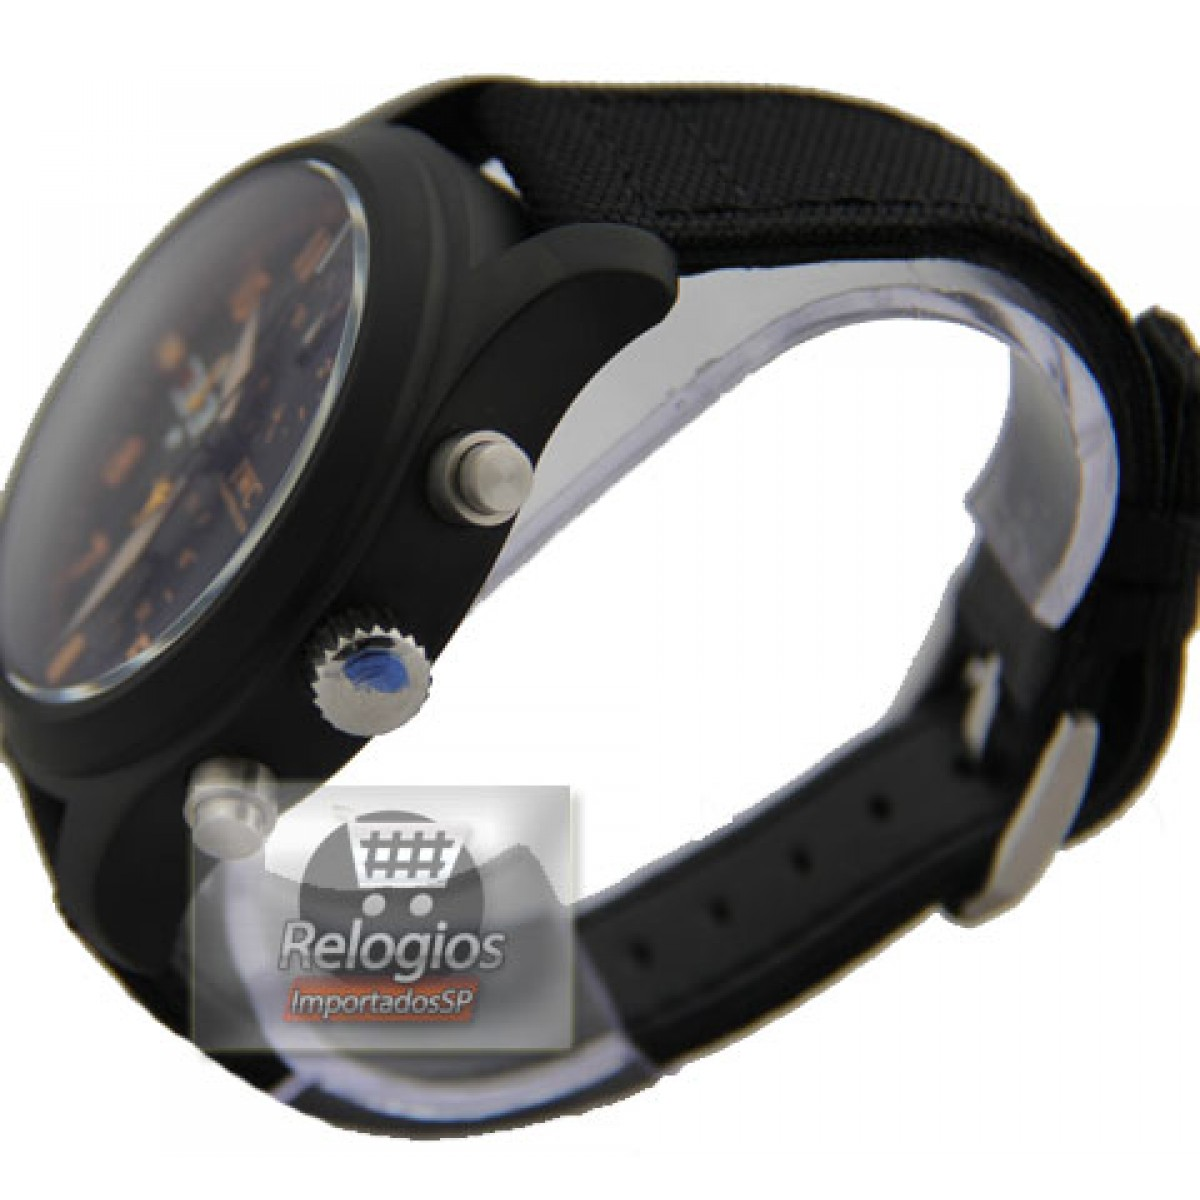 fbcbc8f4374 Relógio Réplica Iwc Top Gun